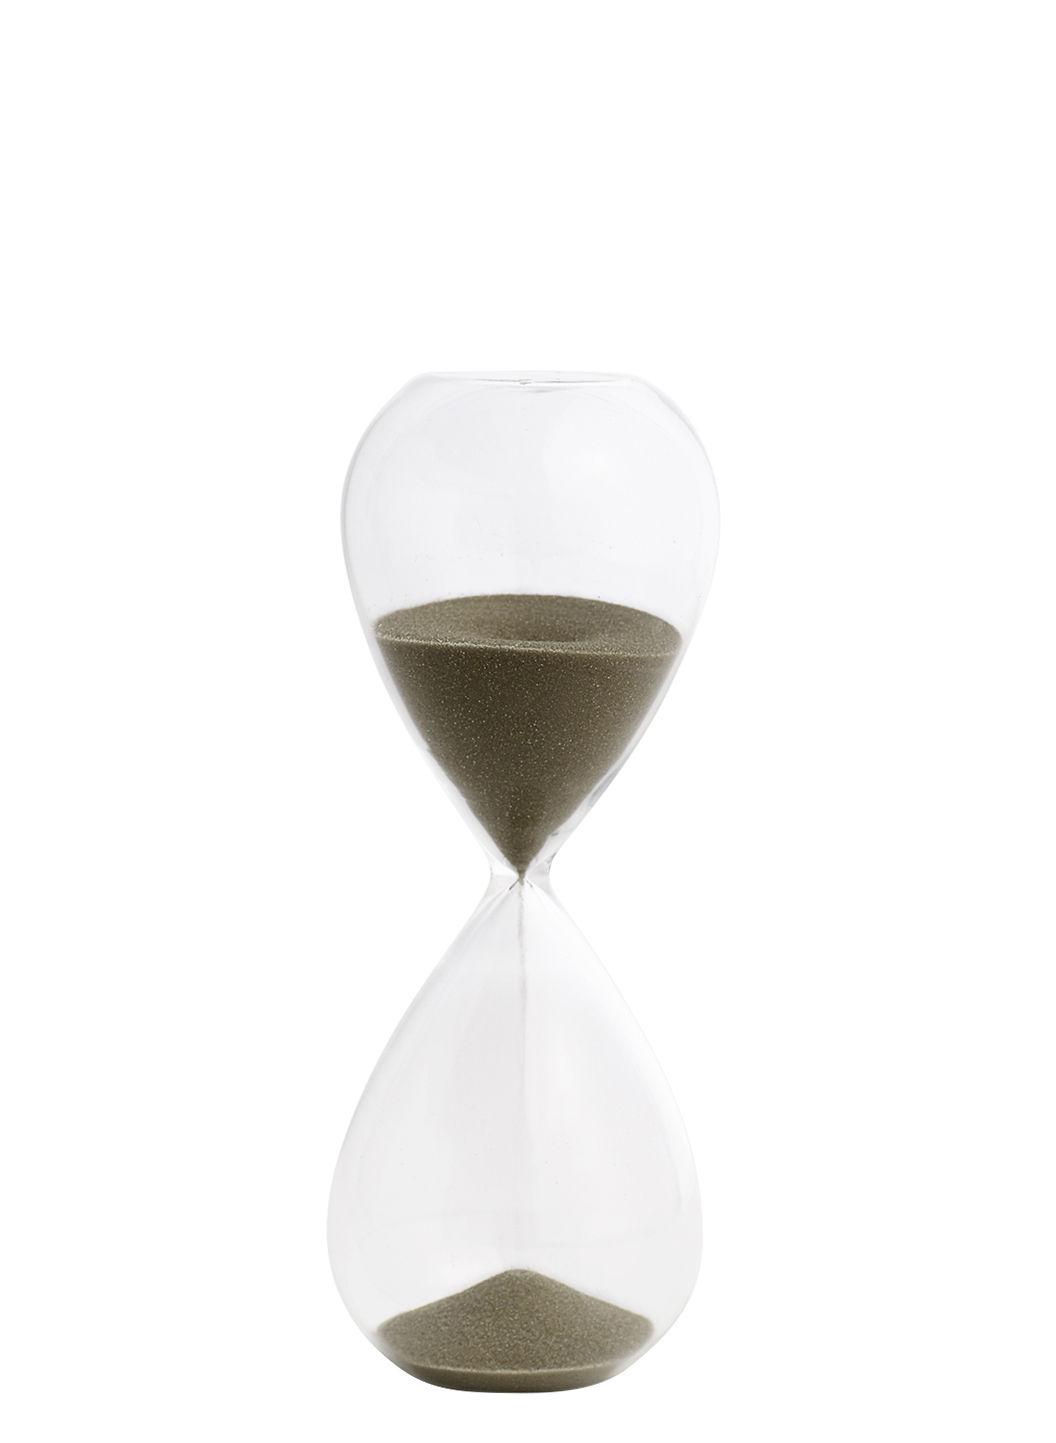 Kitchenware - Kitchen Equipment - Time Medium Egg timer - / 15 minutes - H 15 cm by Hay - Transparent / Gold - Glass, Sand